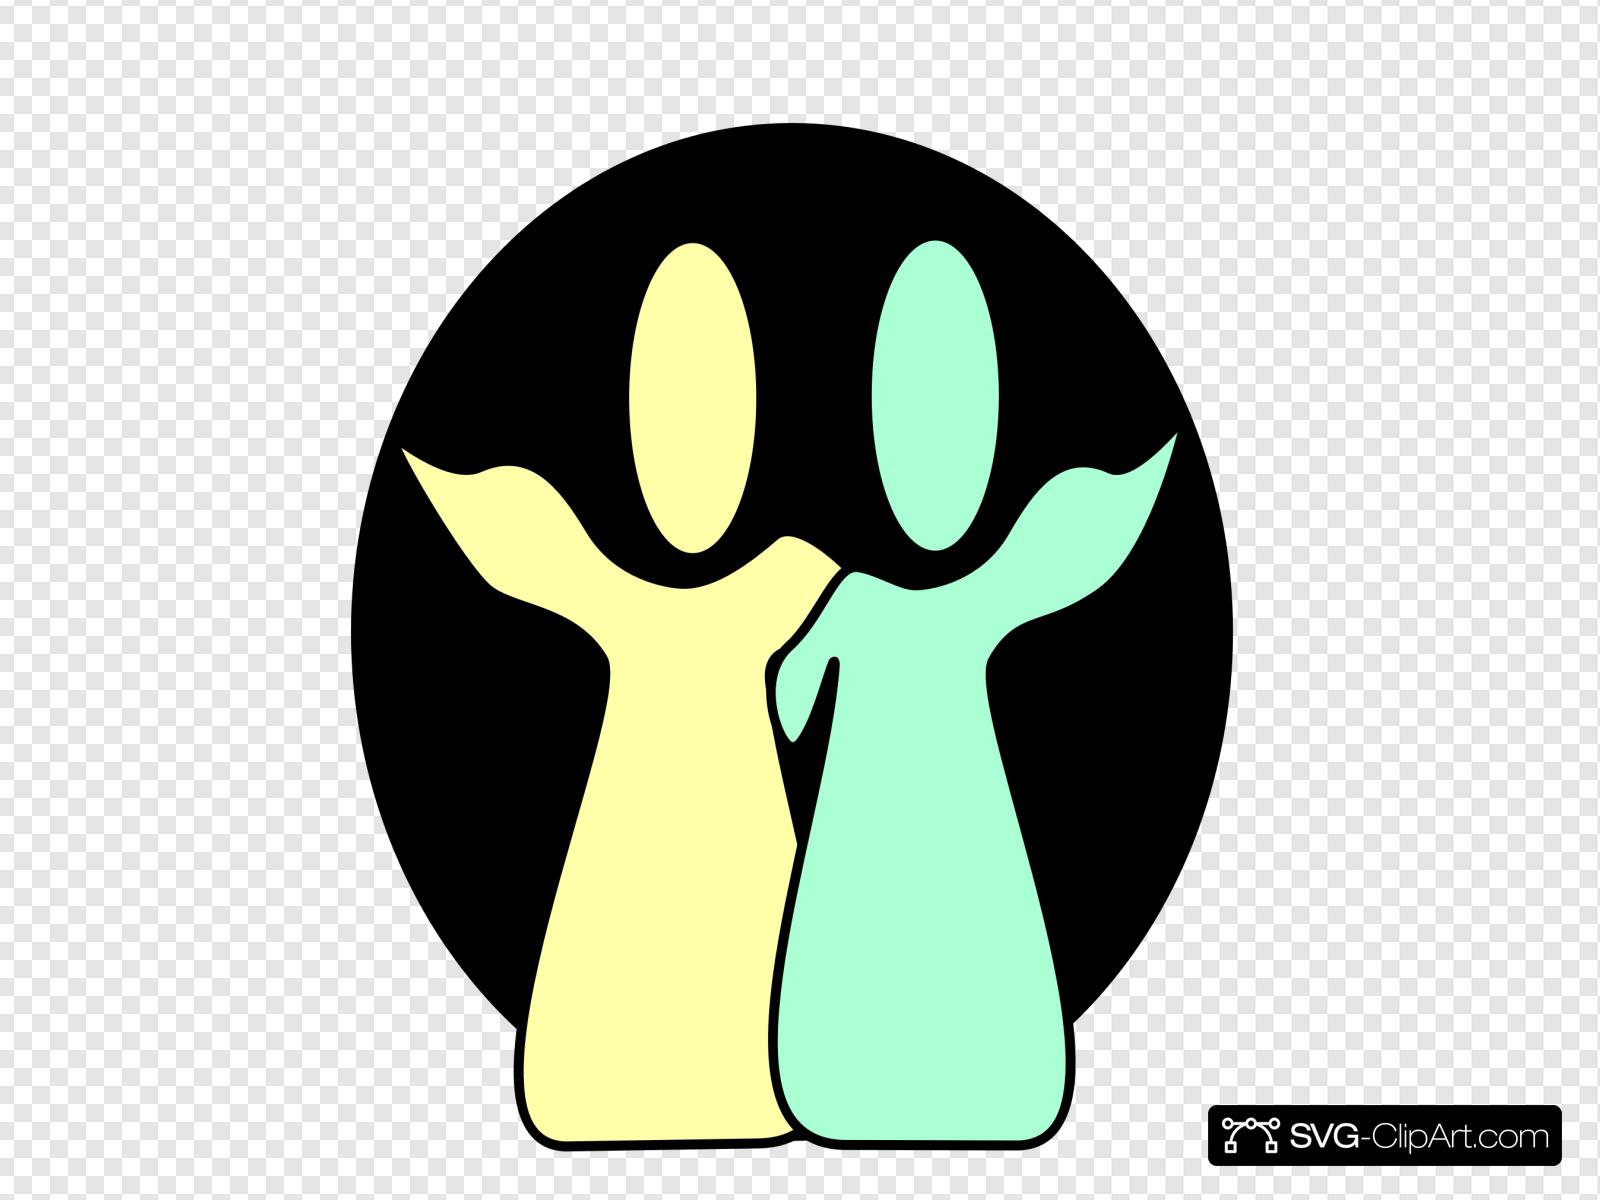 Fellowship 4 Clip art, Icon and SVG.